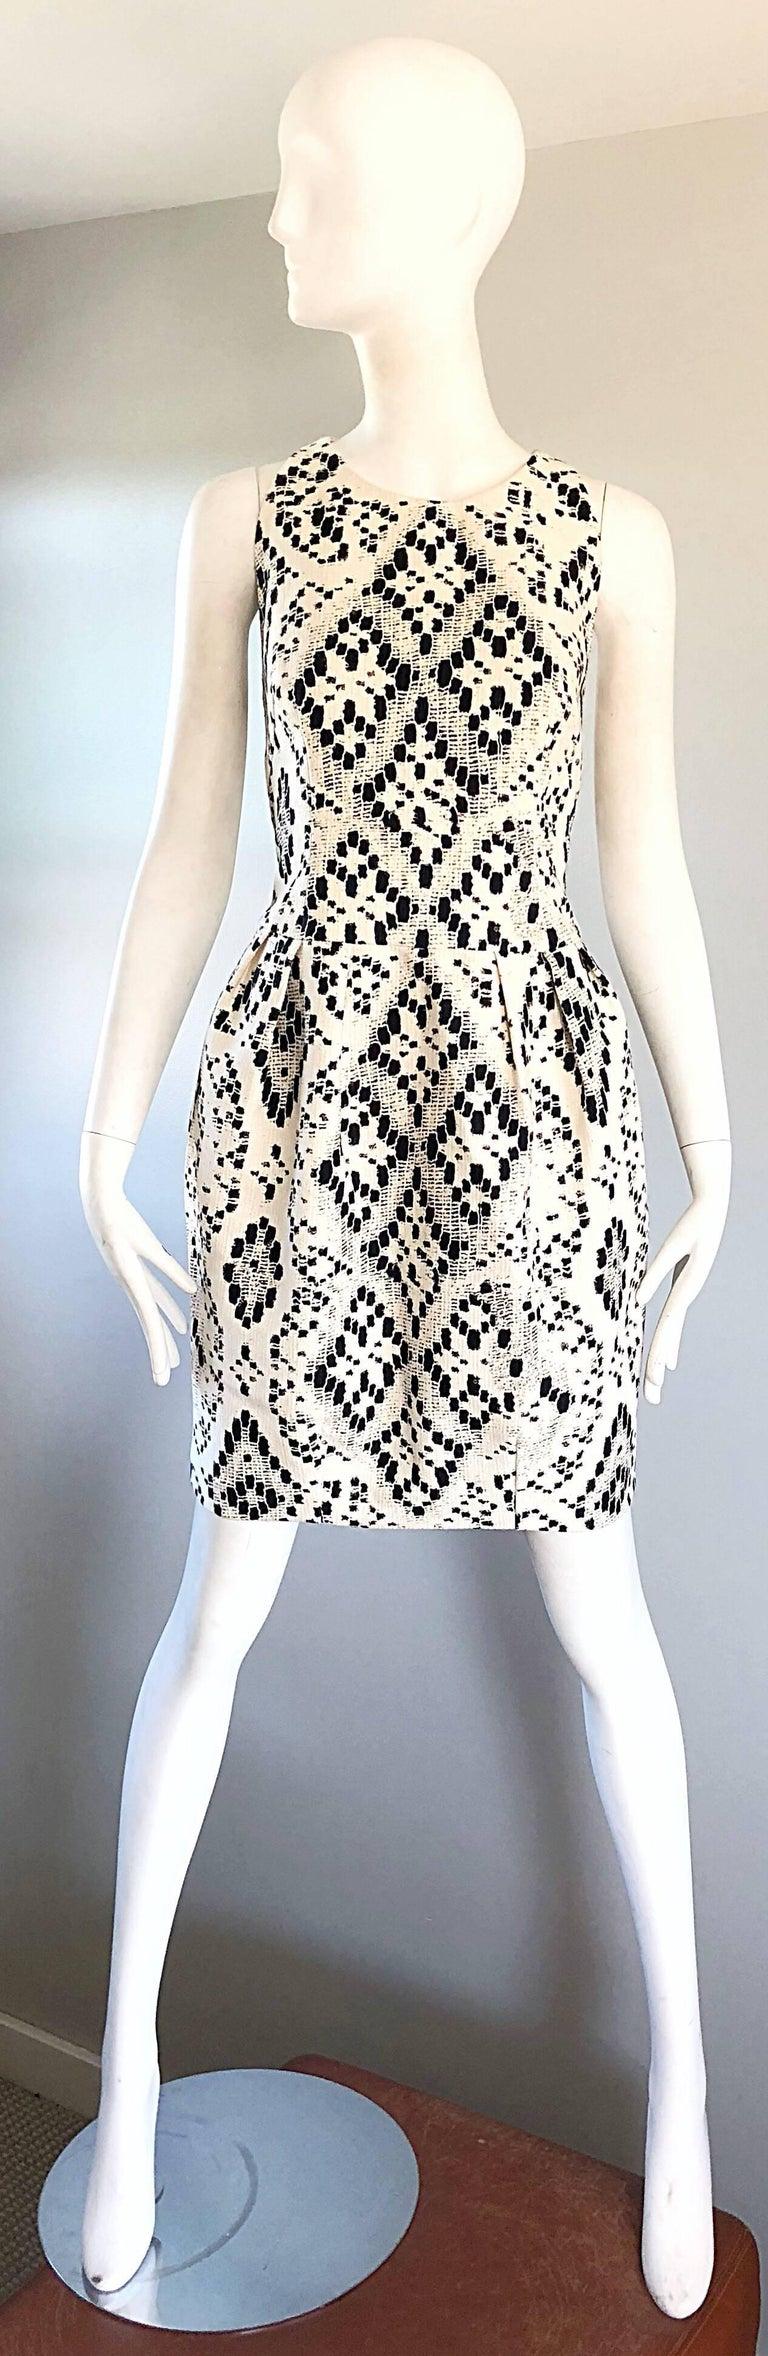 Giambattista Valli Size 10 / 12 Black and White Abstract Sleeveless Dress For Sale 4